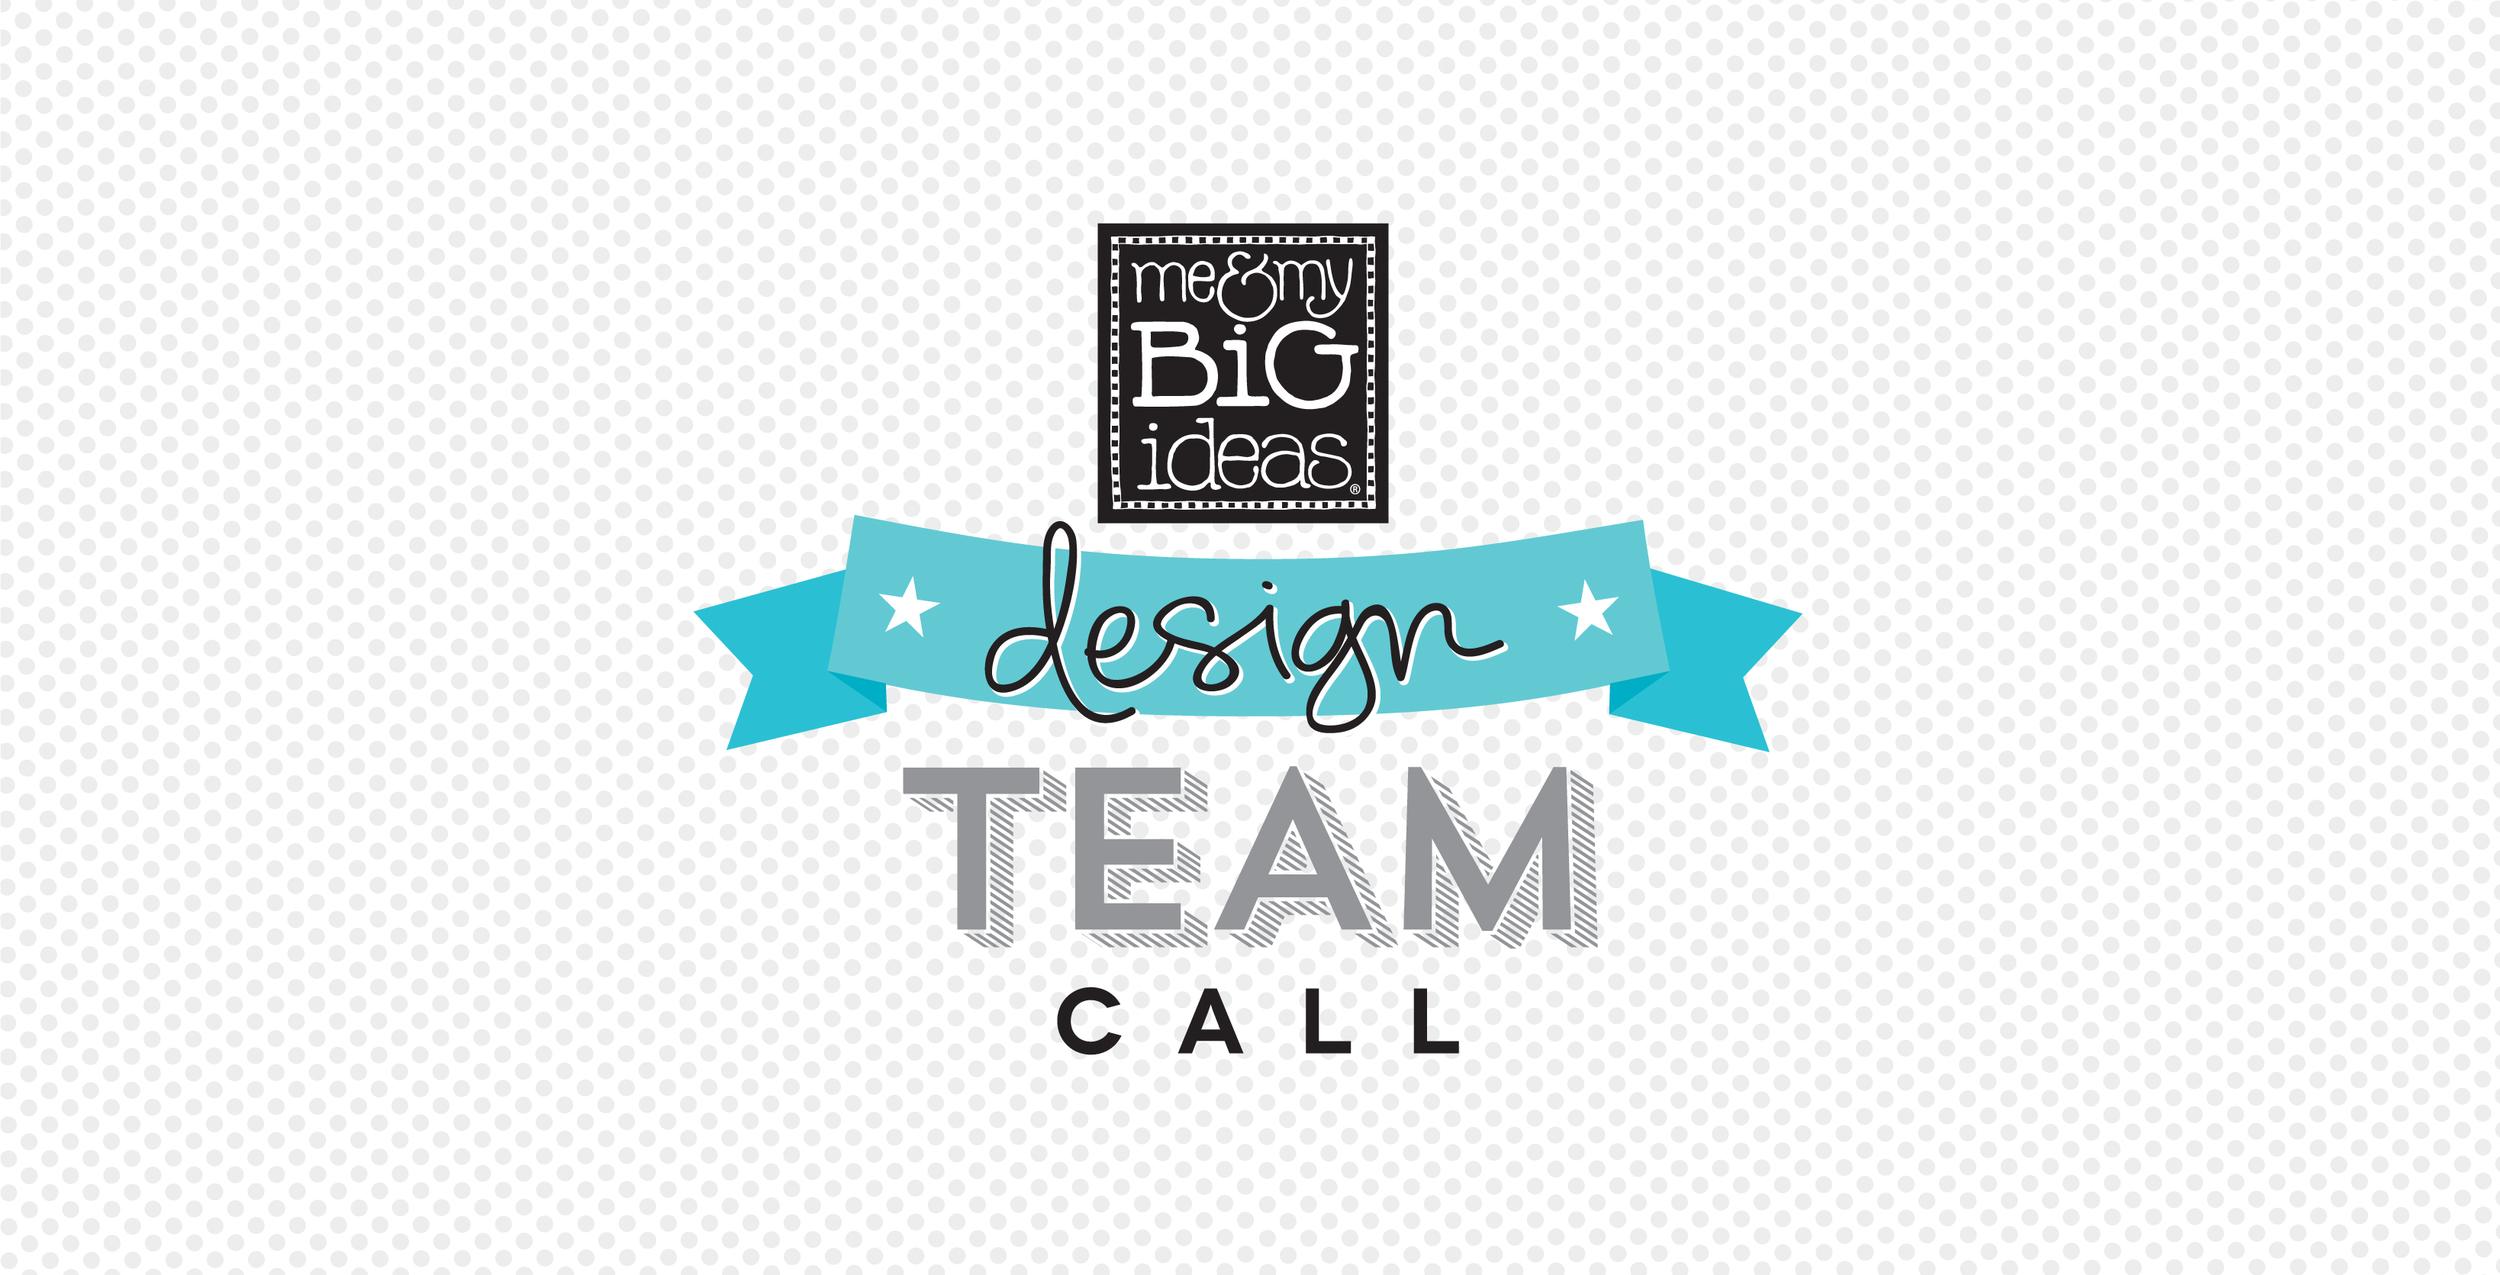 mambi 2014-2015 design team call.